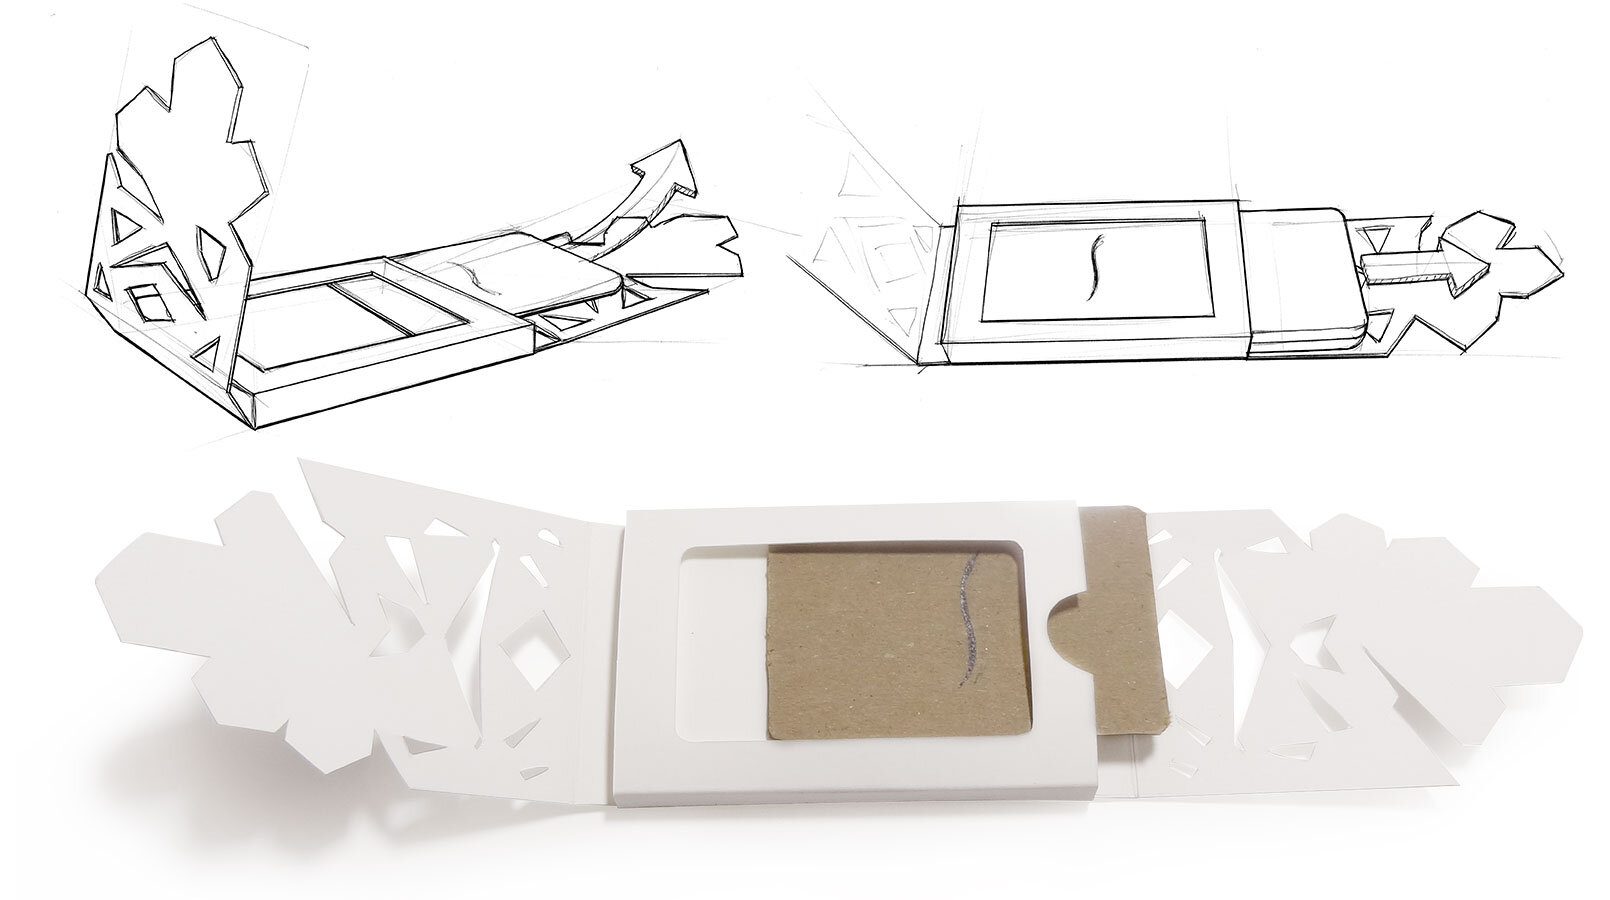 Sephora-snowflake-holiday-gift-card-packaging-company-design-2.jpg